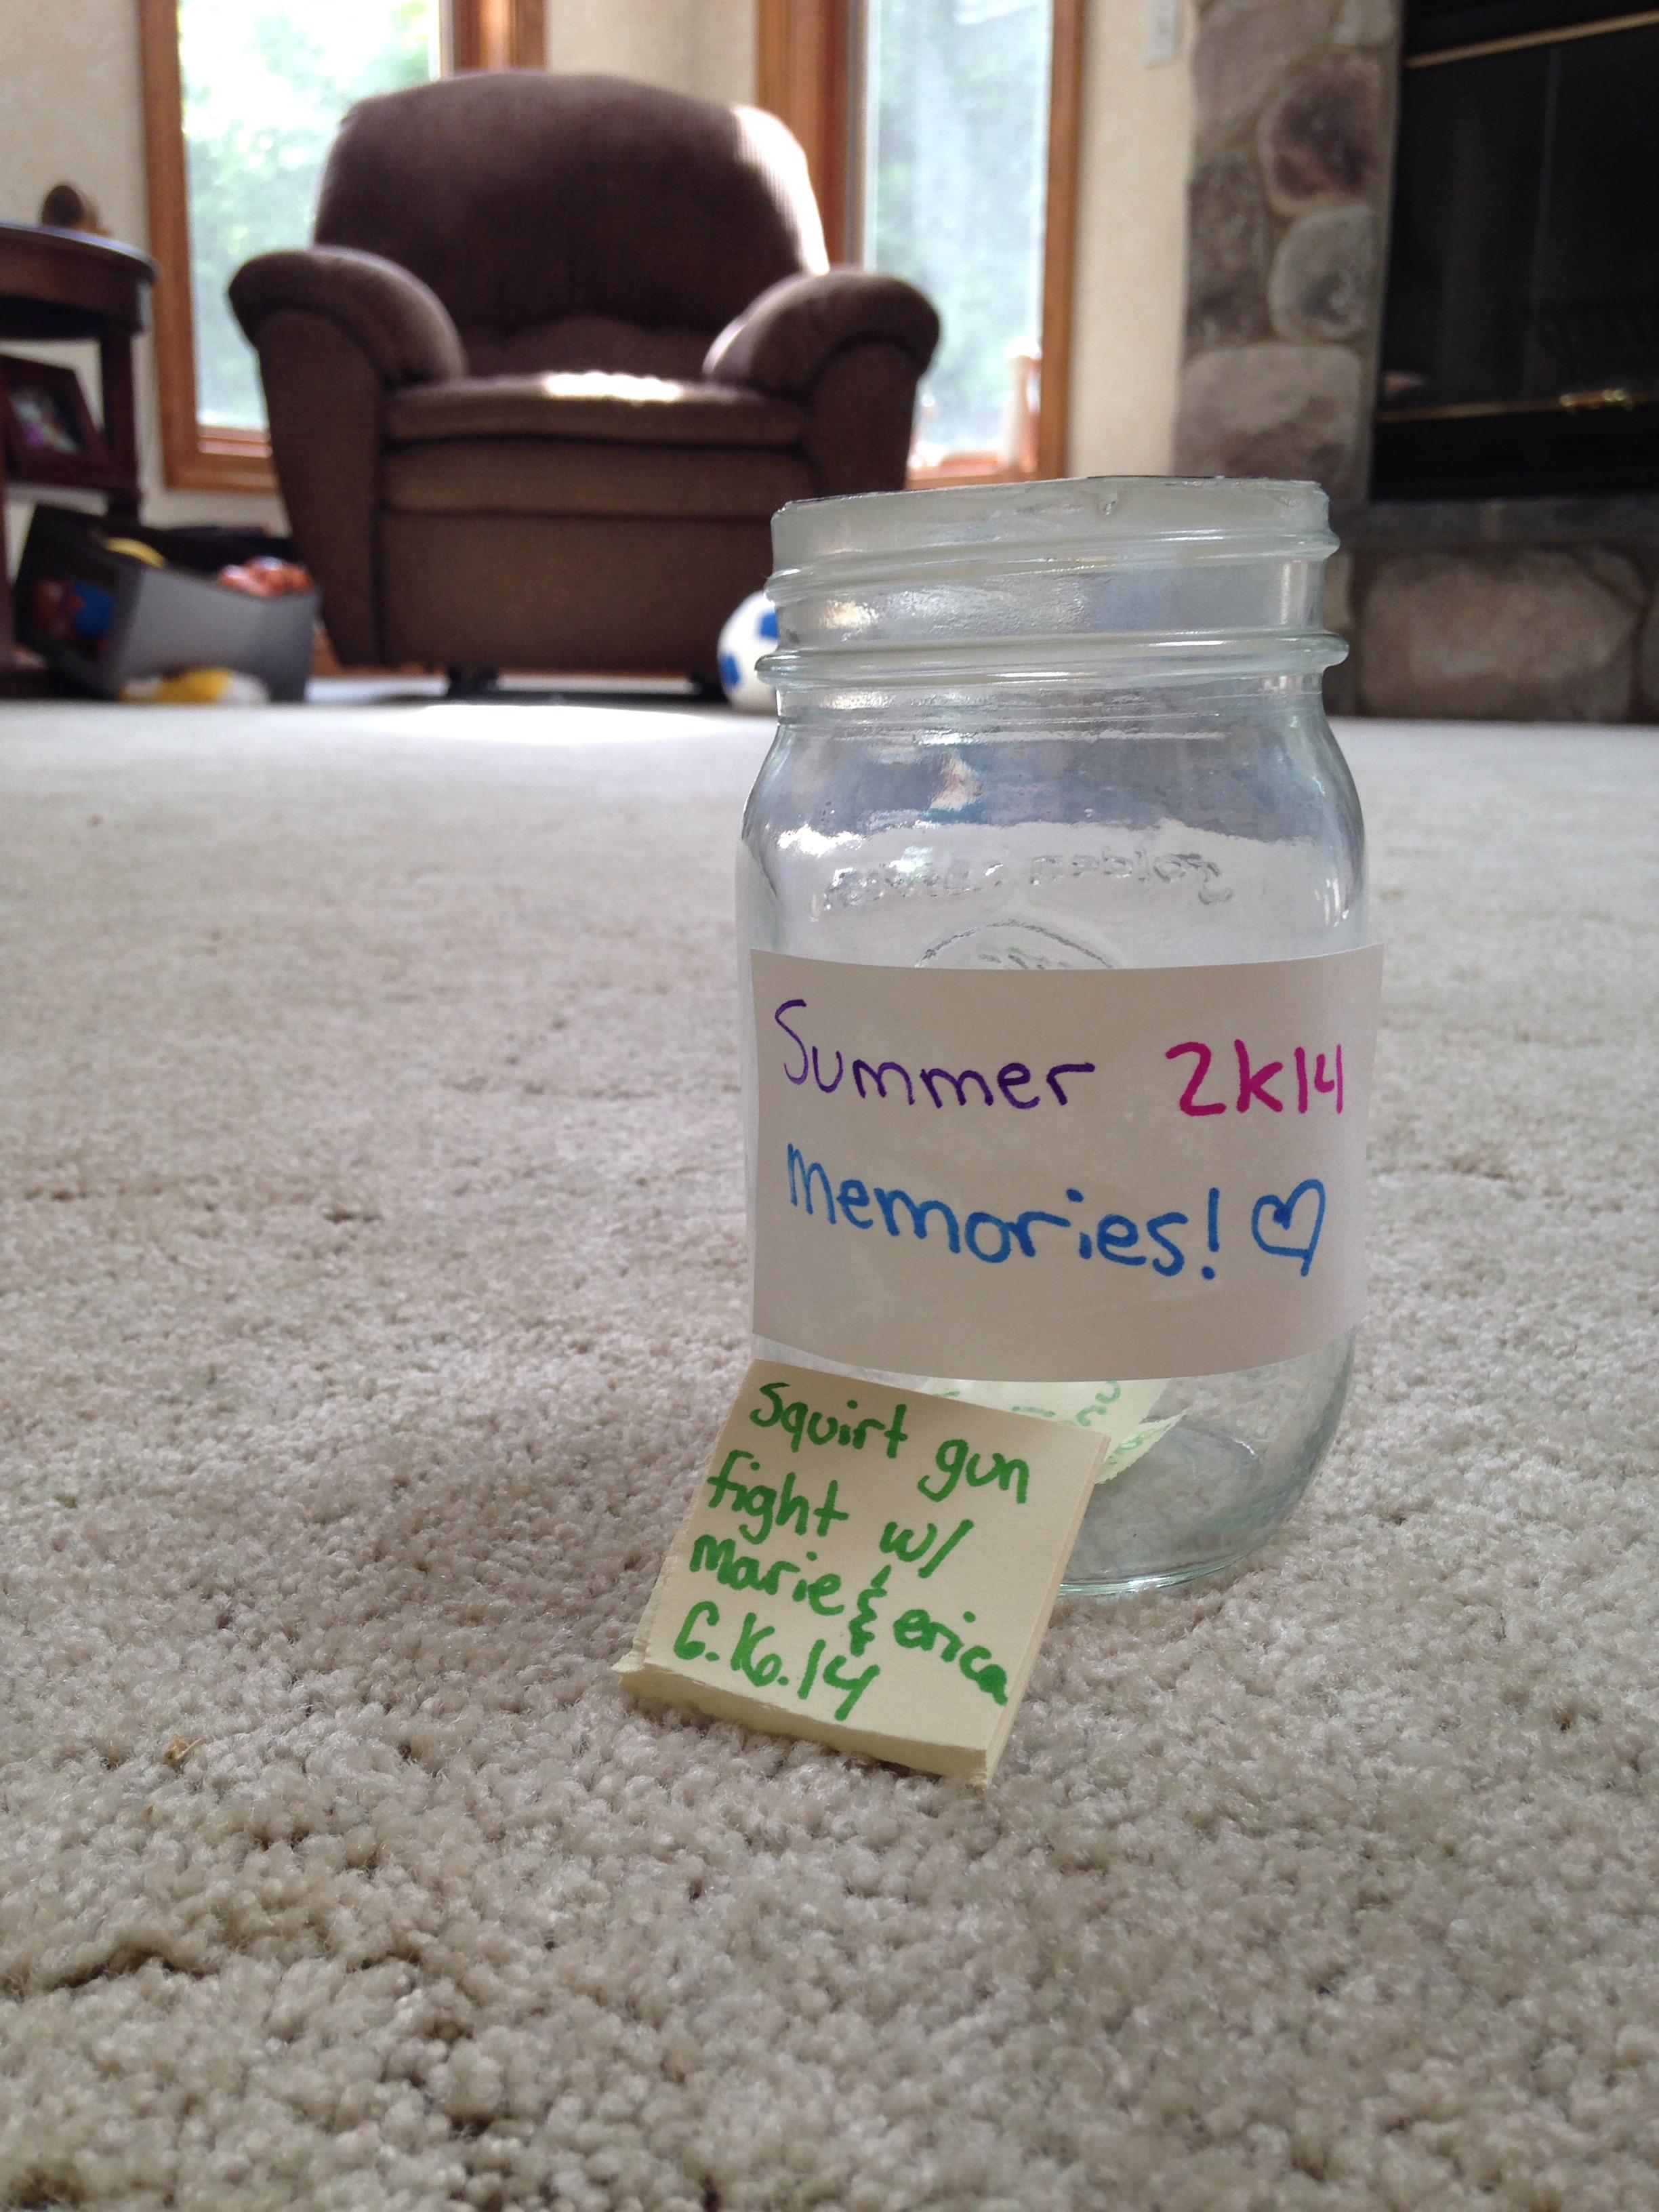 Summer 2k14 Memories Jar